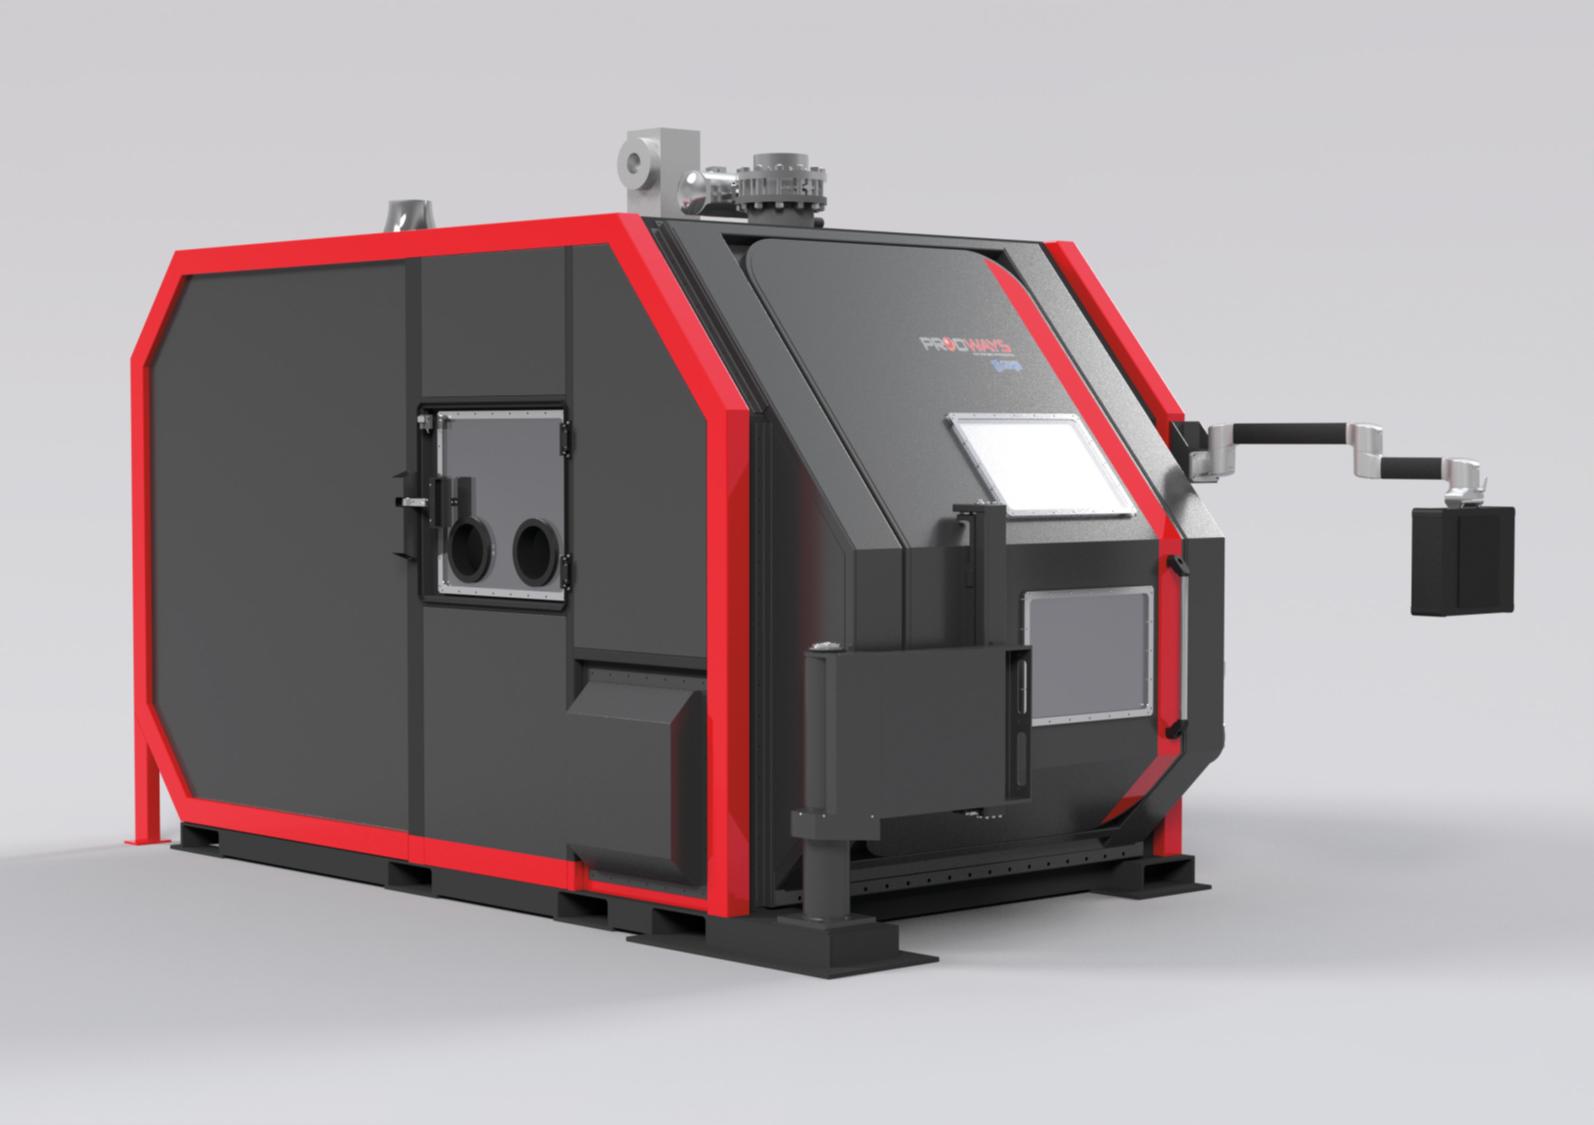 Prodways RAF metal 3D printer. Image via Prodways.